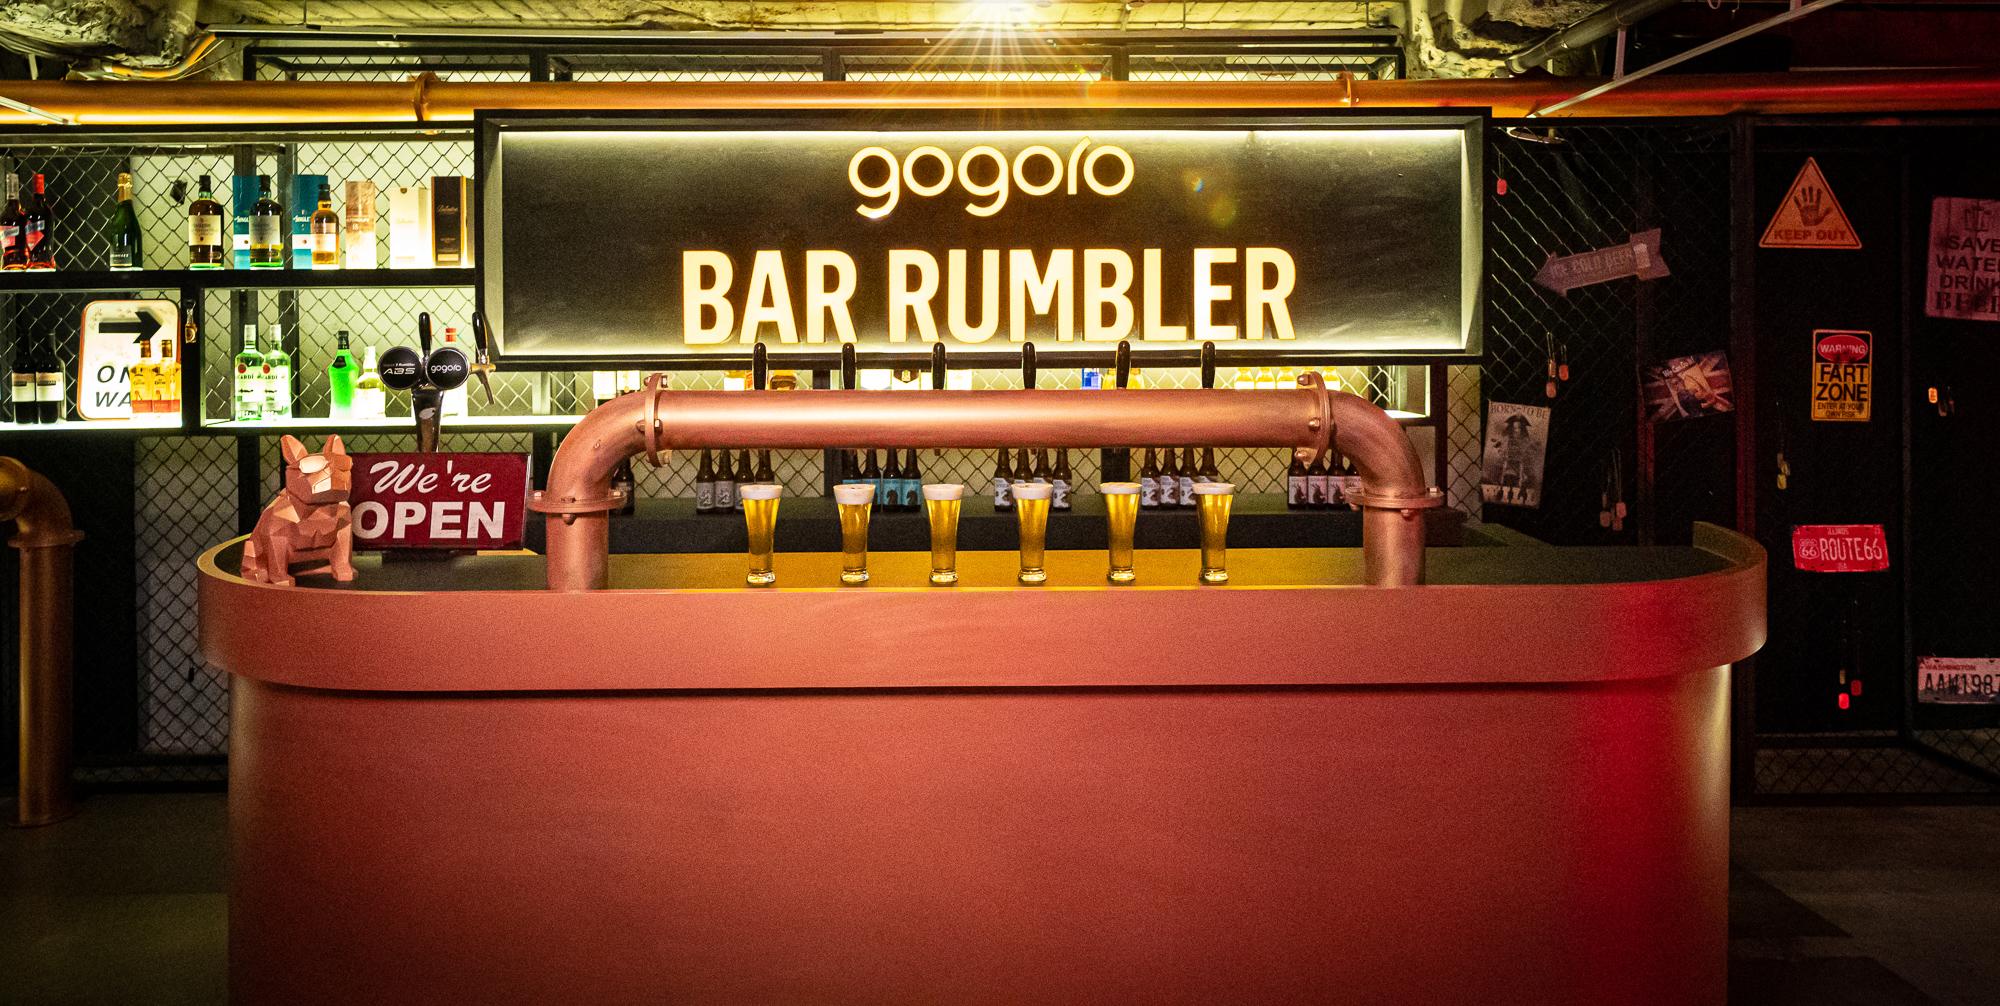 Gogoro 此次特別打造台北街頭的隱藏美式酒吧 - BAR Rumbler ( 濕地 - 台北市中山區林森北路 107 巷 10 號 B1 )。